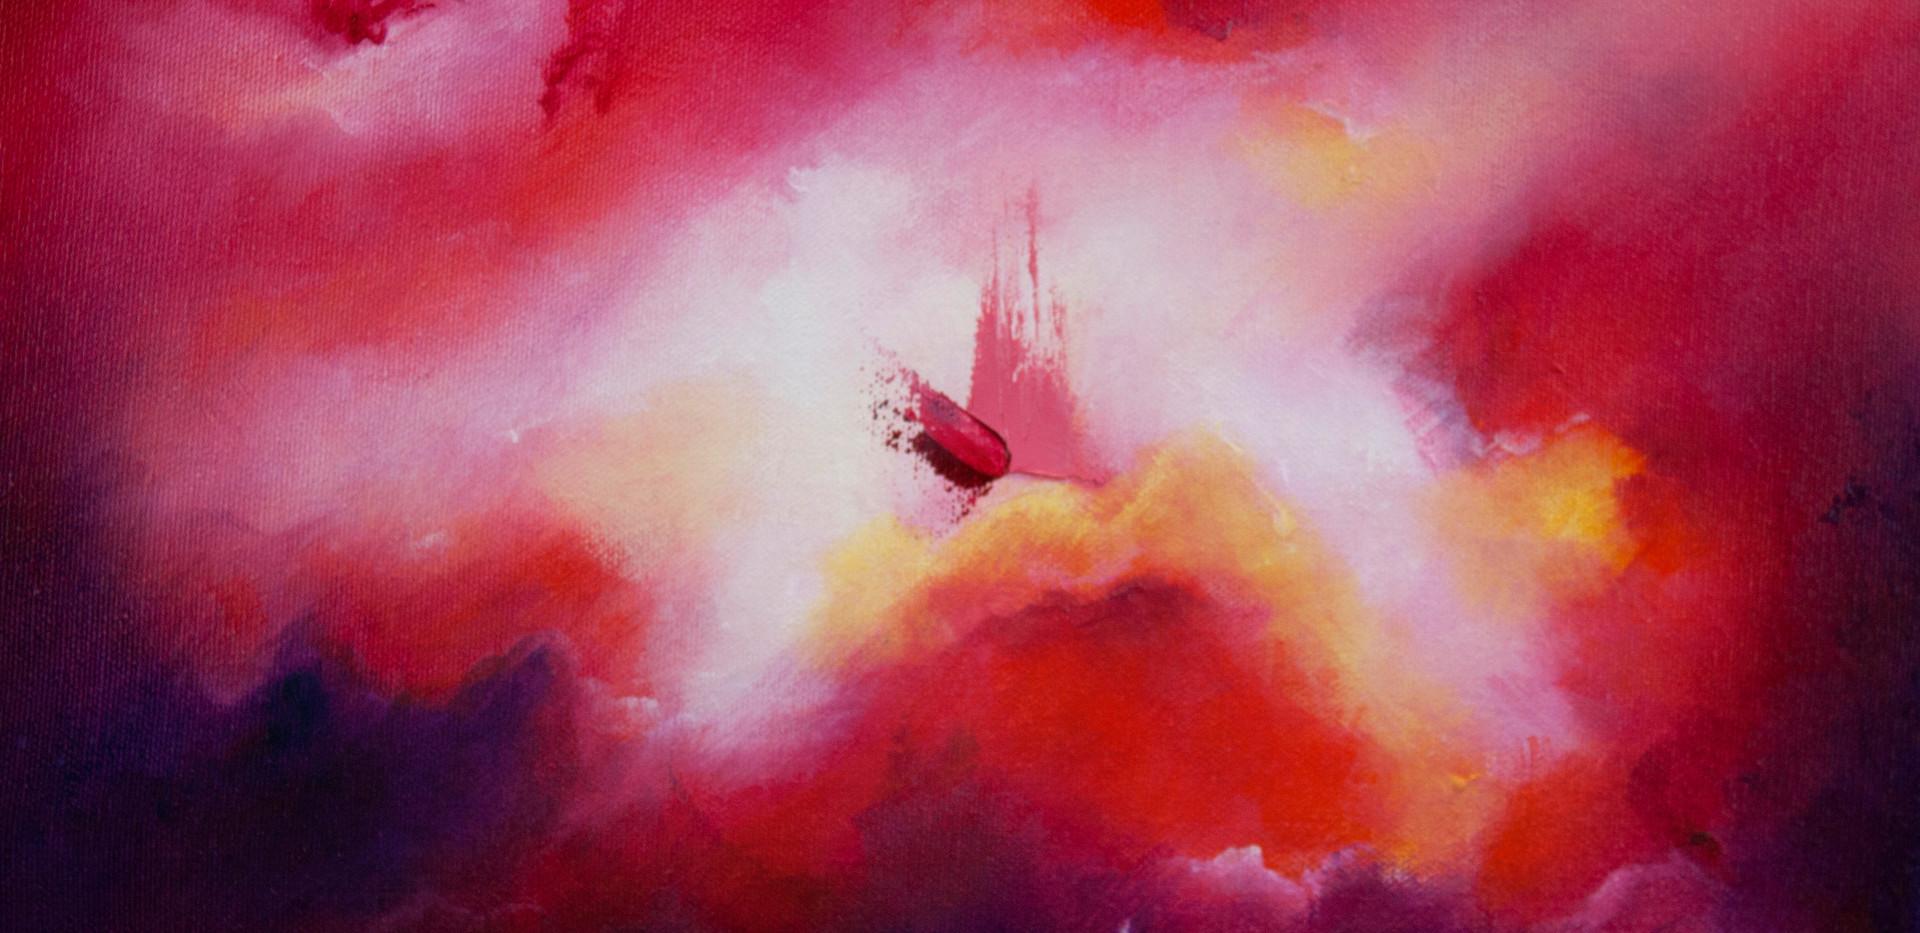 De la serie Beauty and Light 3 óleo sobre lienzo 25 x 35 cm